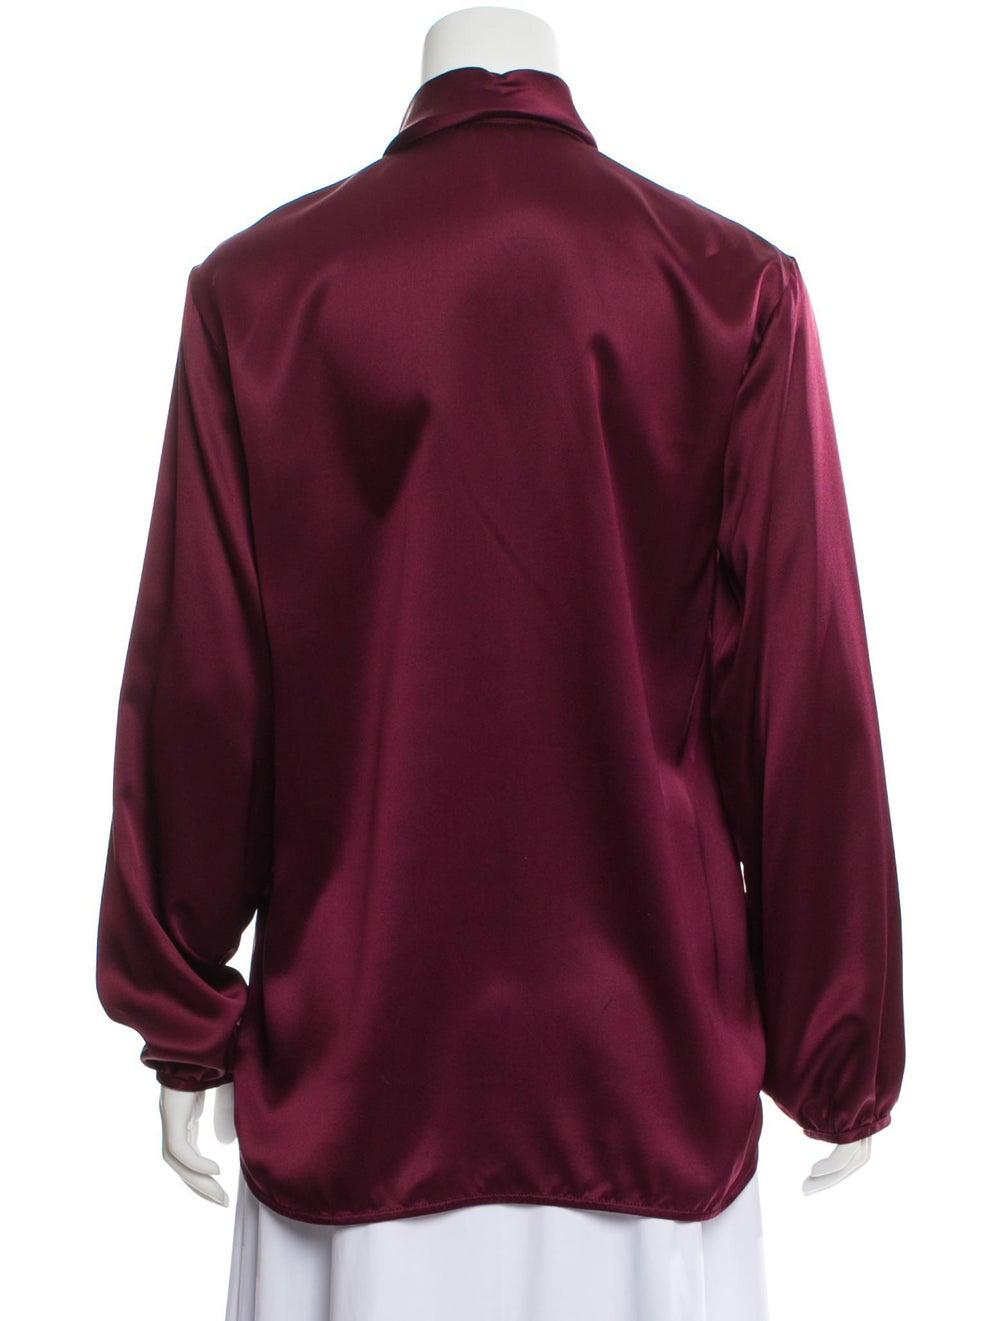 Celine Silk Long Sleeve Blouse - image 3